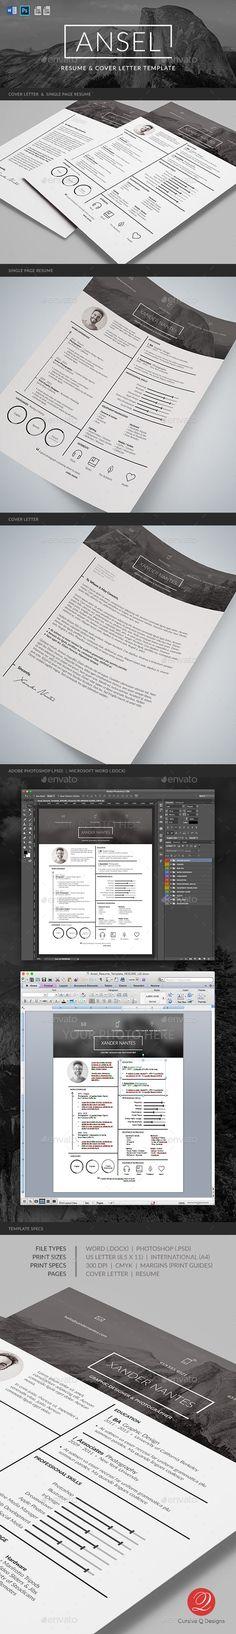 101 best CREATIVE CV images on Pinterest | Resume design, Creative ...